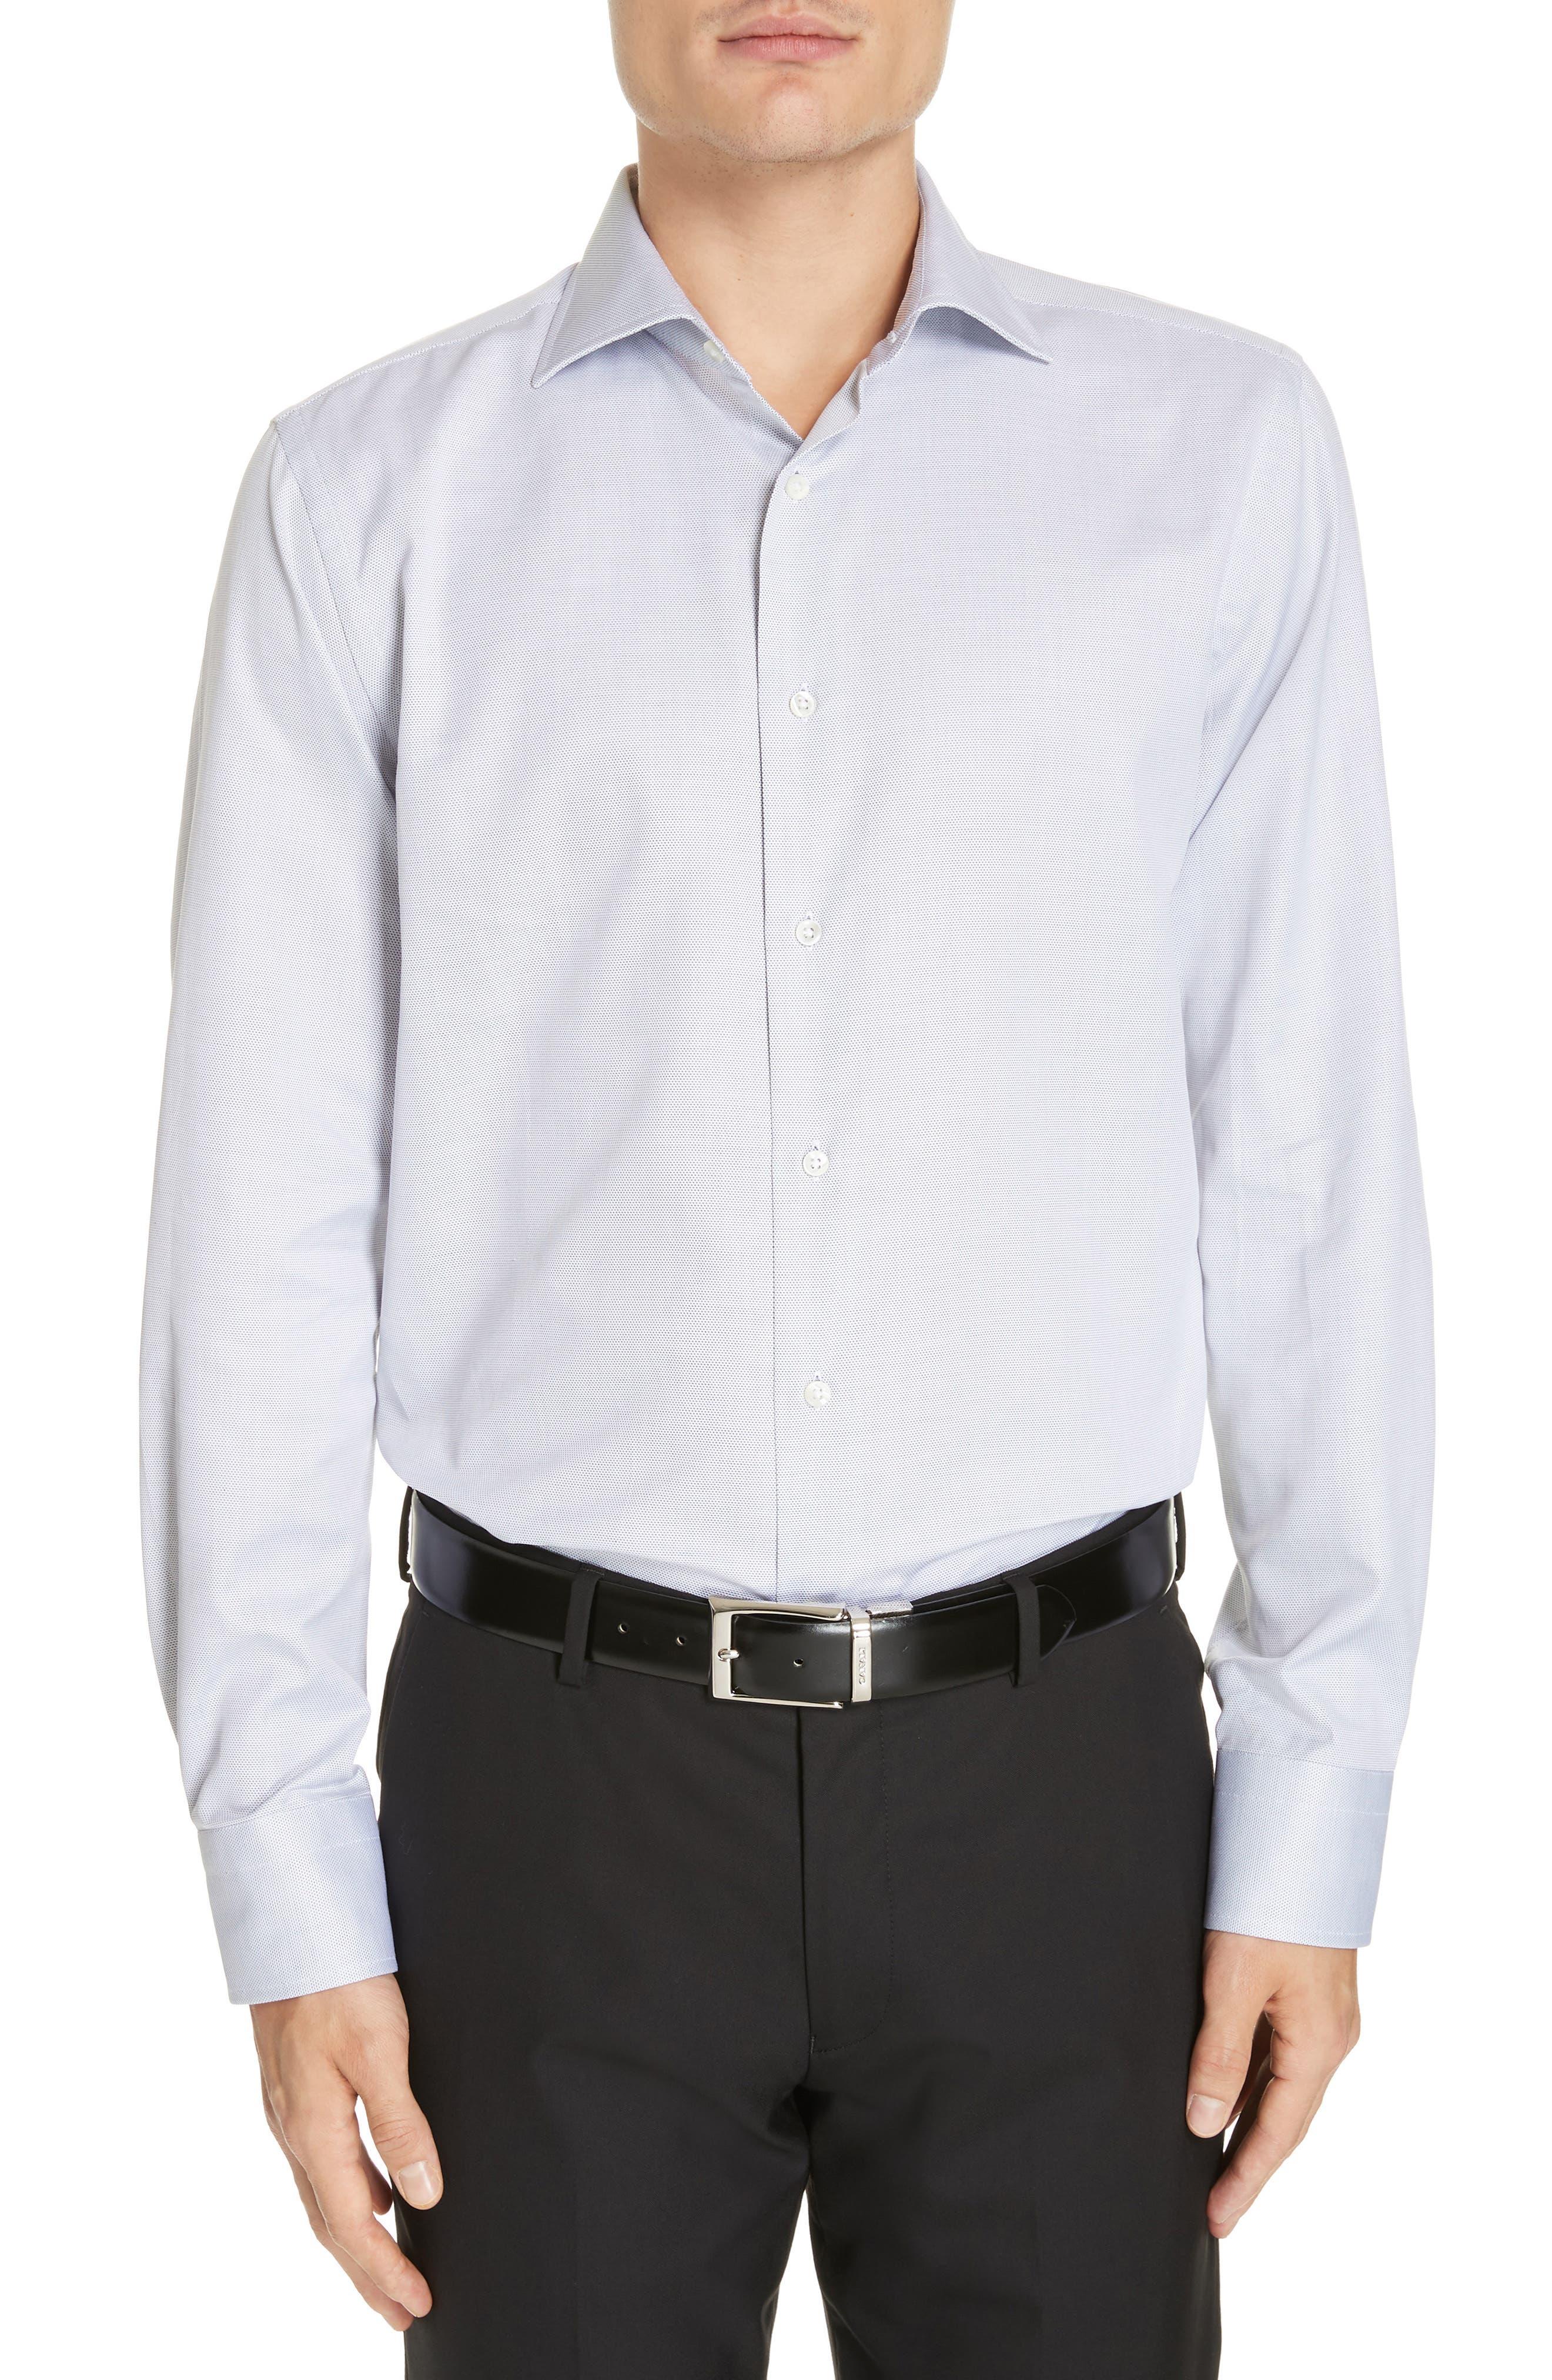 CANALI, Regular Fit Print Dress Shirt, Main thumbnail 1, color, GREY